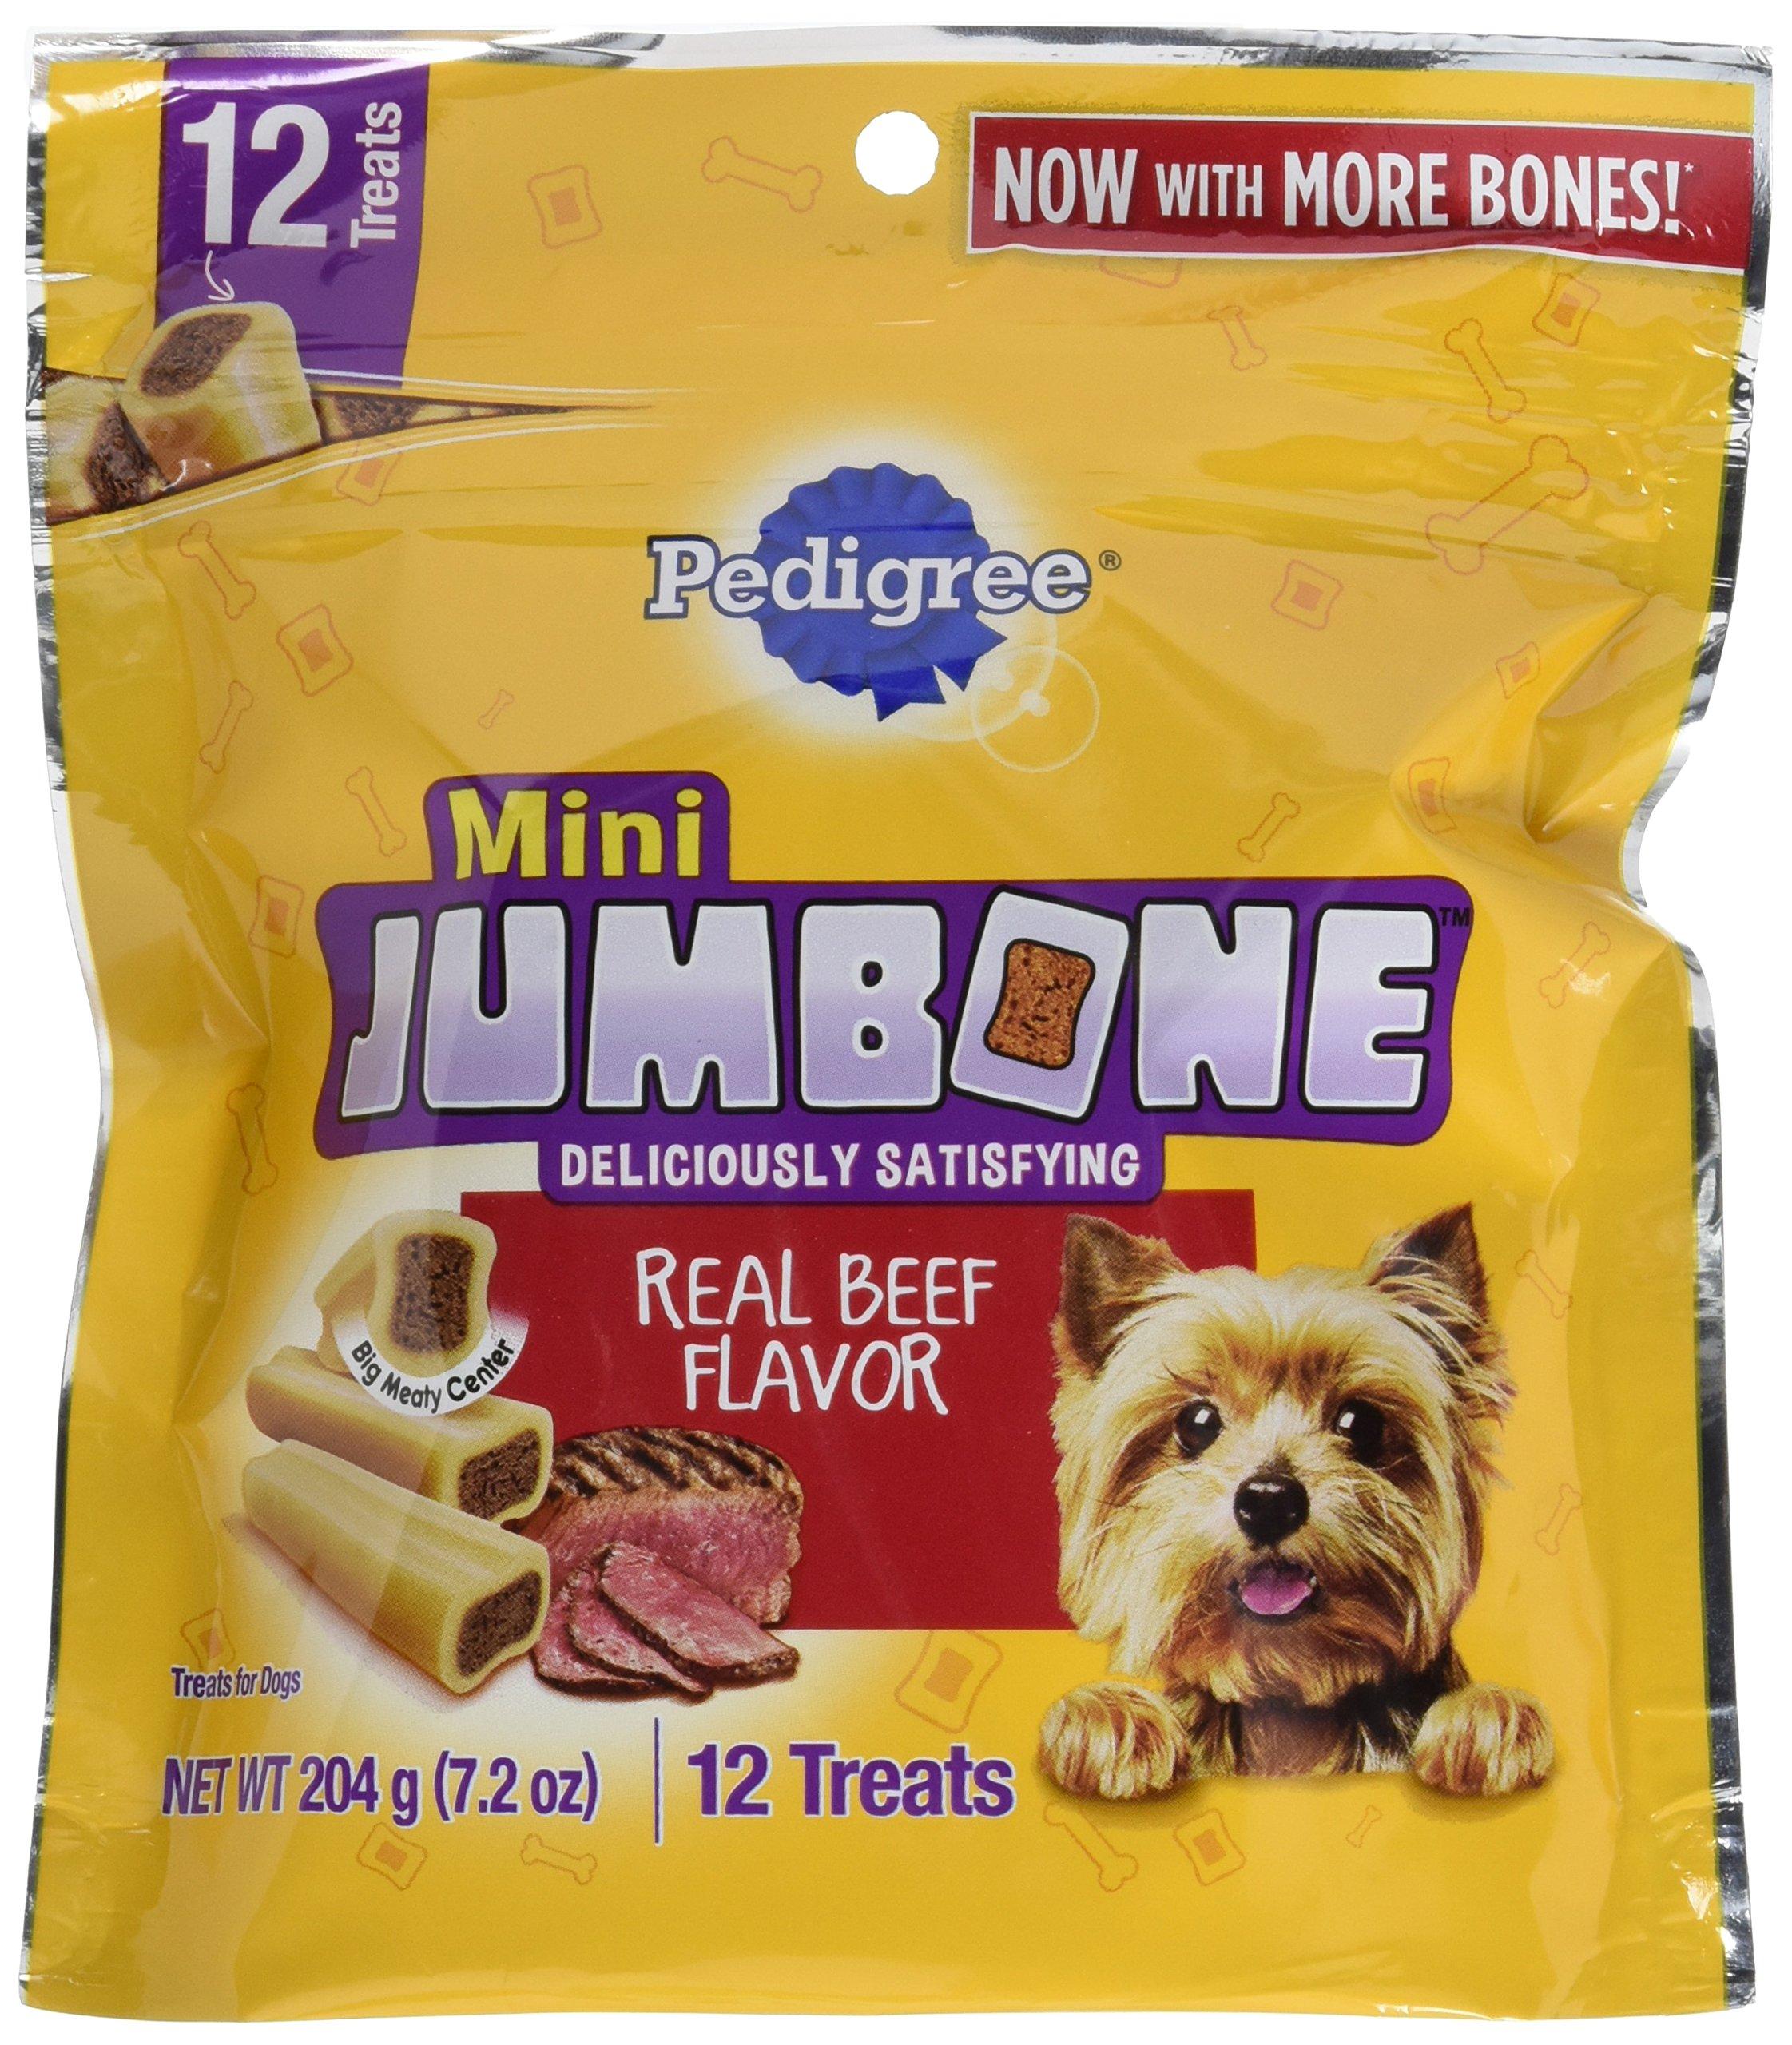 Pedigree Jumbone Real Beef Flavor Mini Dog Treats (12 Treats), 7.2 Oz, Pack Of 8